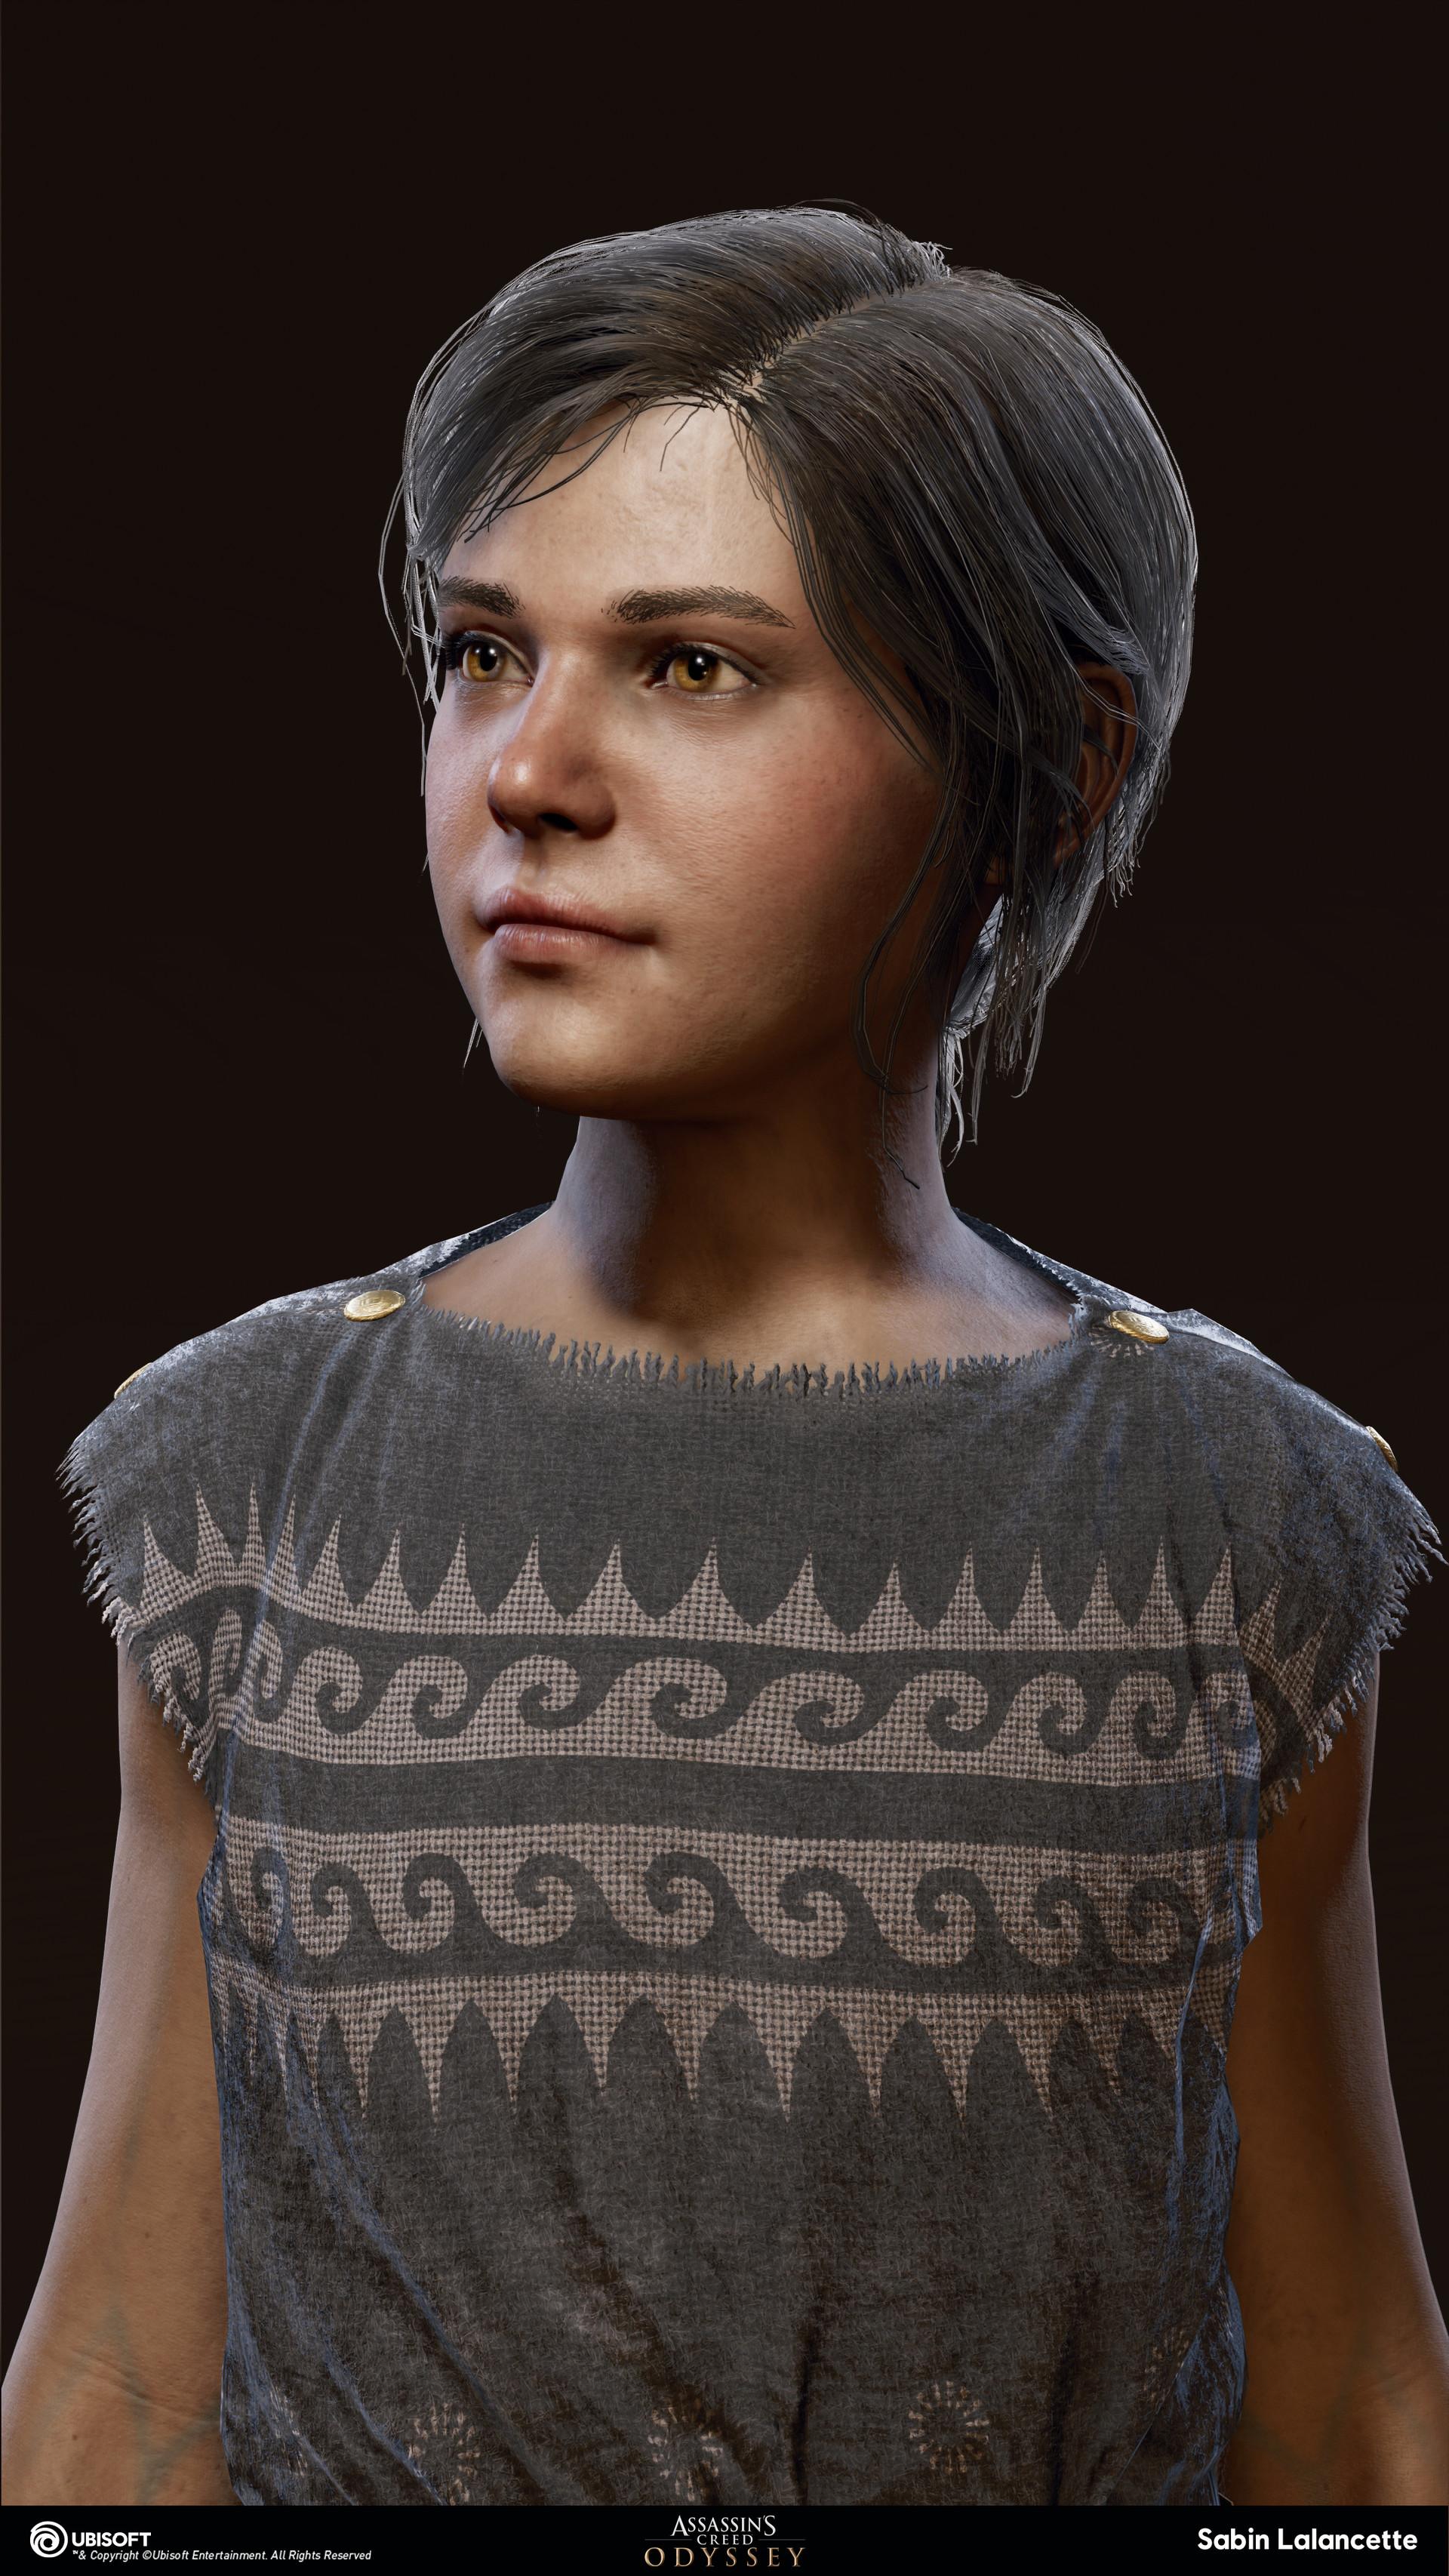 sabin-lalancette-artblast-fullsize-hex-portrait-young-kassandra-slalancette